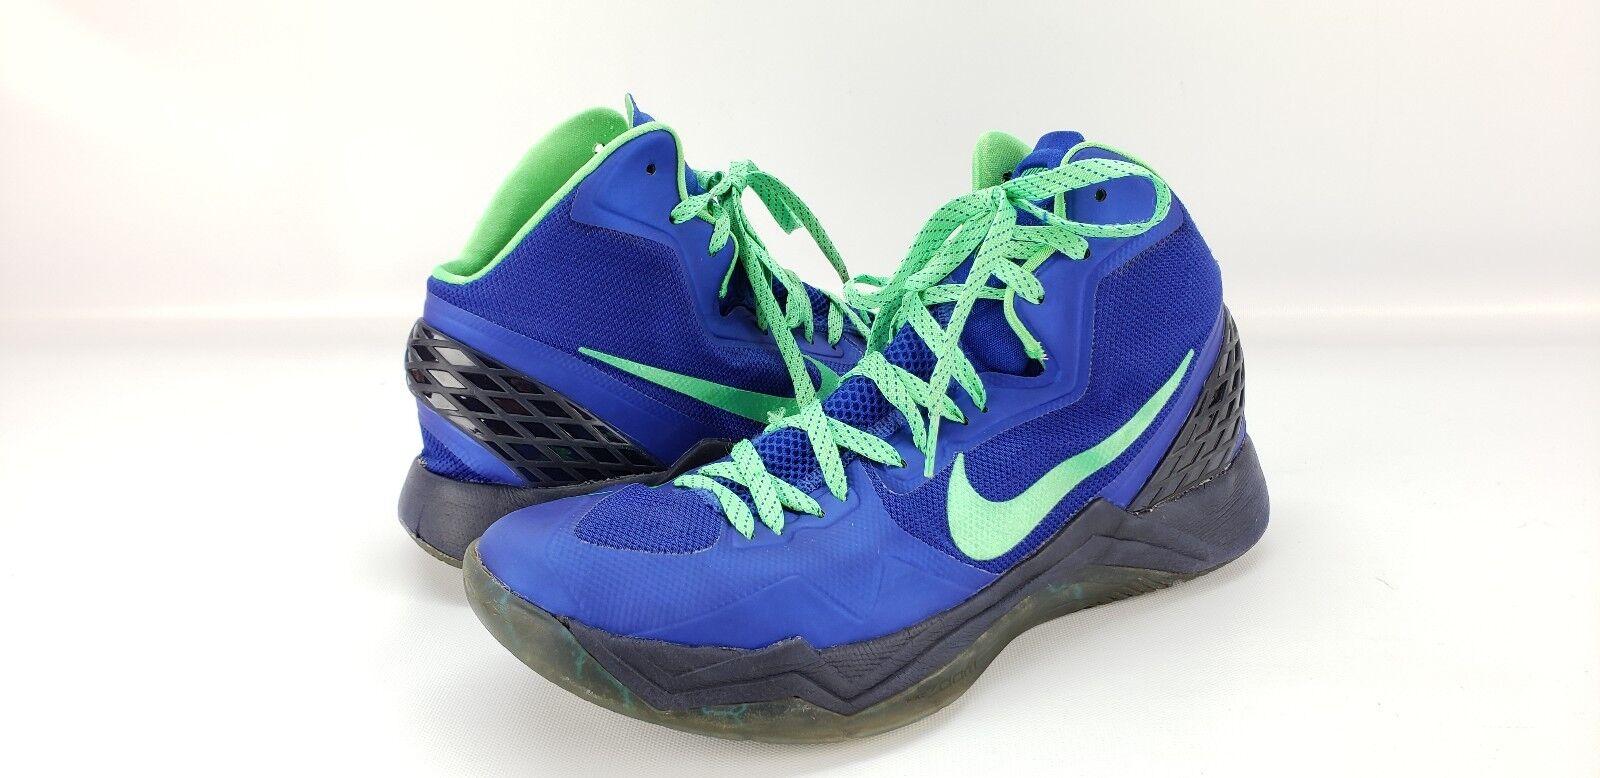 Nike Zoom Hyperdisruptor Men's bluee Green Basketball shoes Size 12